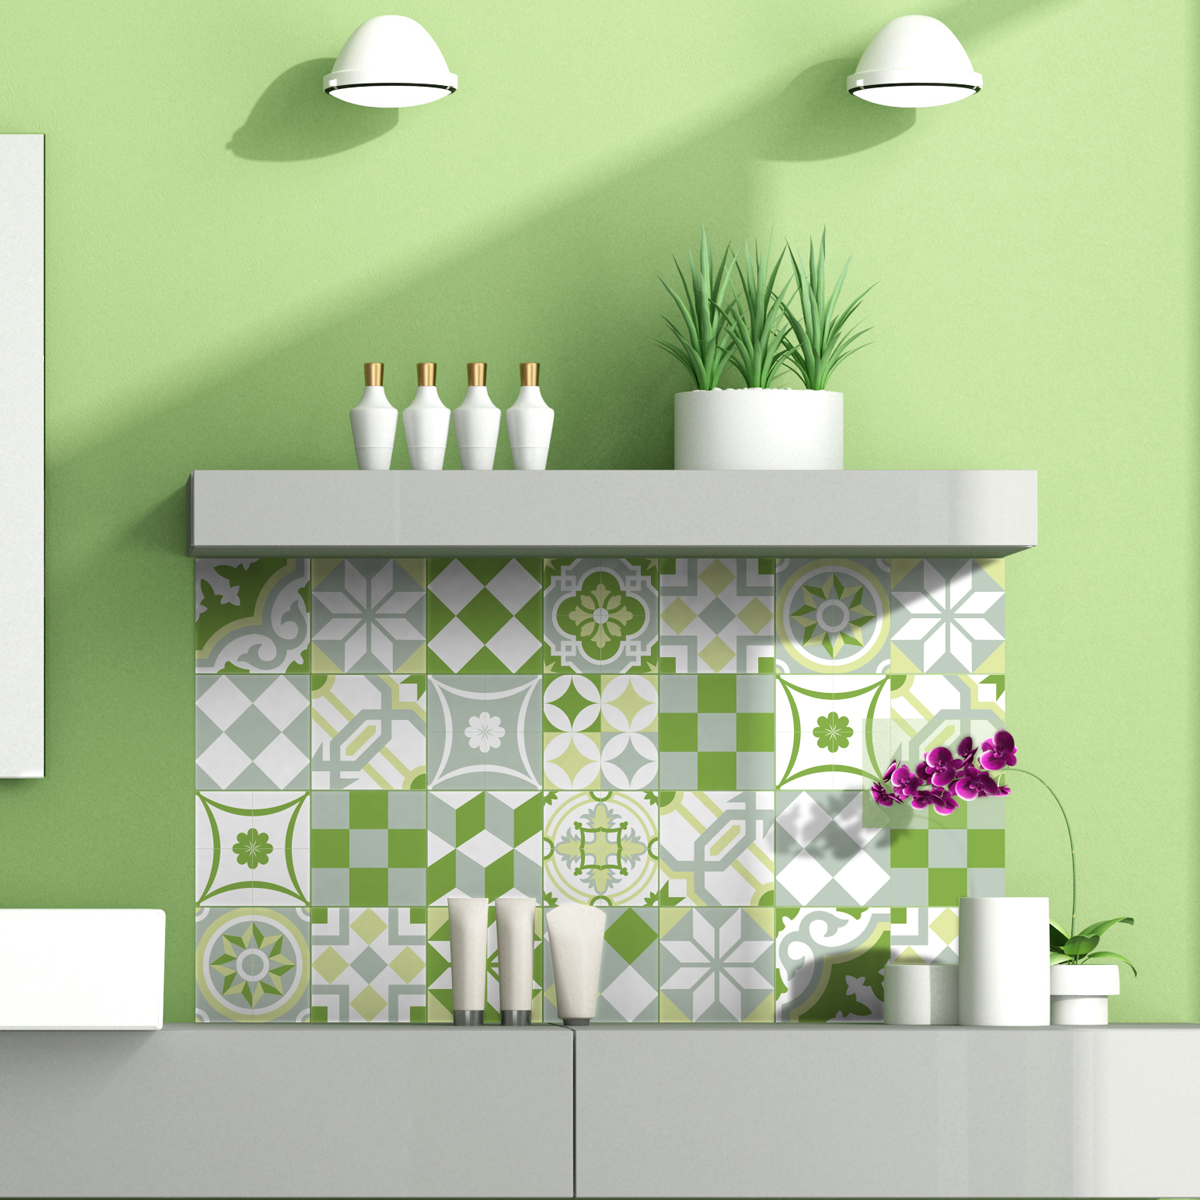 24 stickers carrelages ornements verdoyant art et design artistiques ambiance sticker. Black Bedroom Furniture Sets. Home Design Ideas